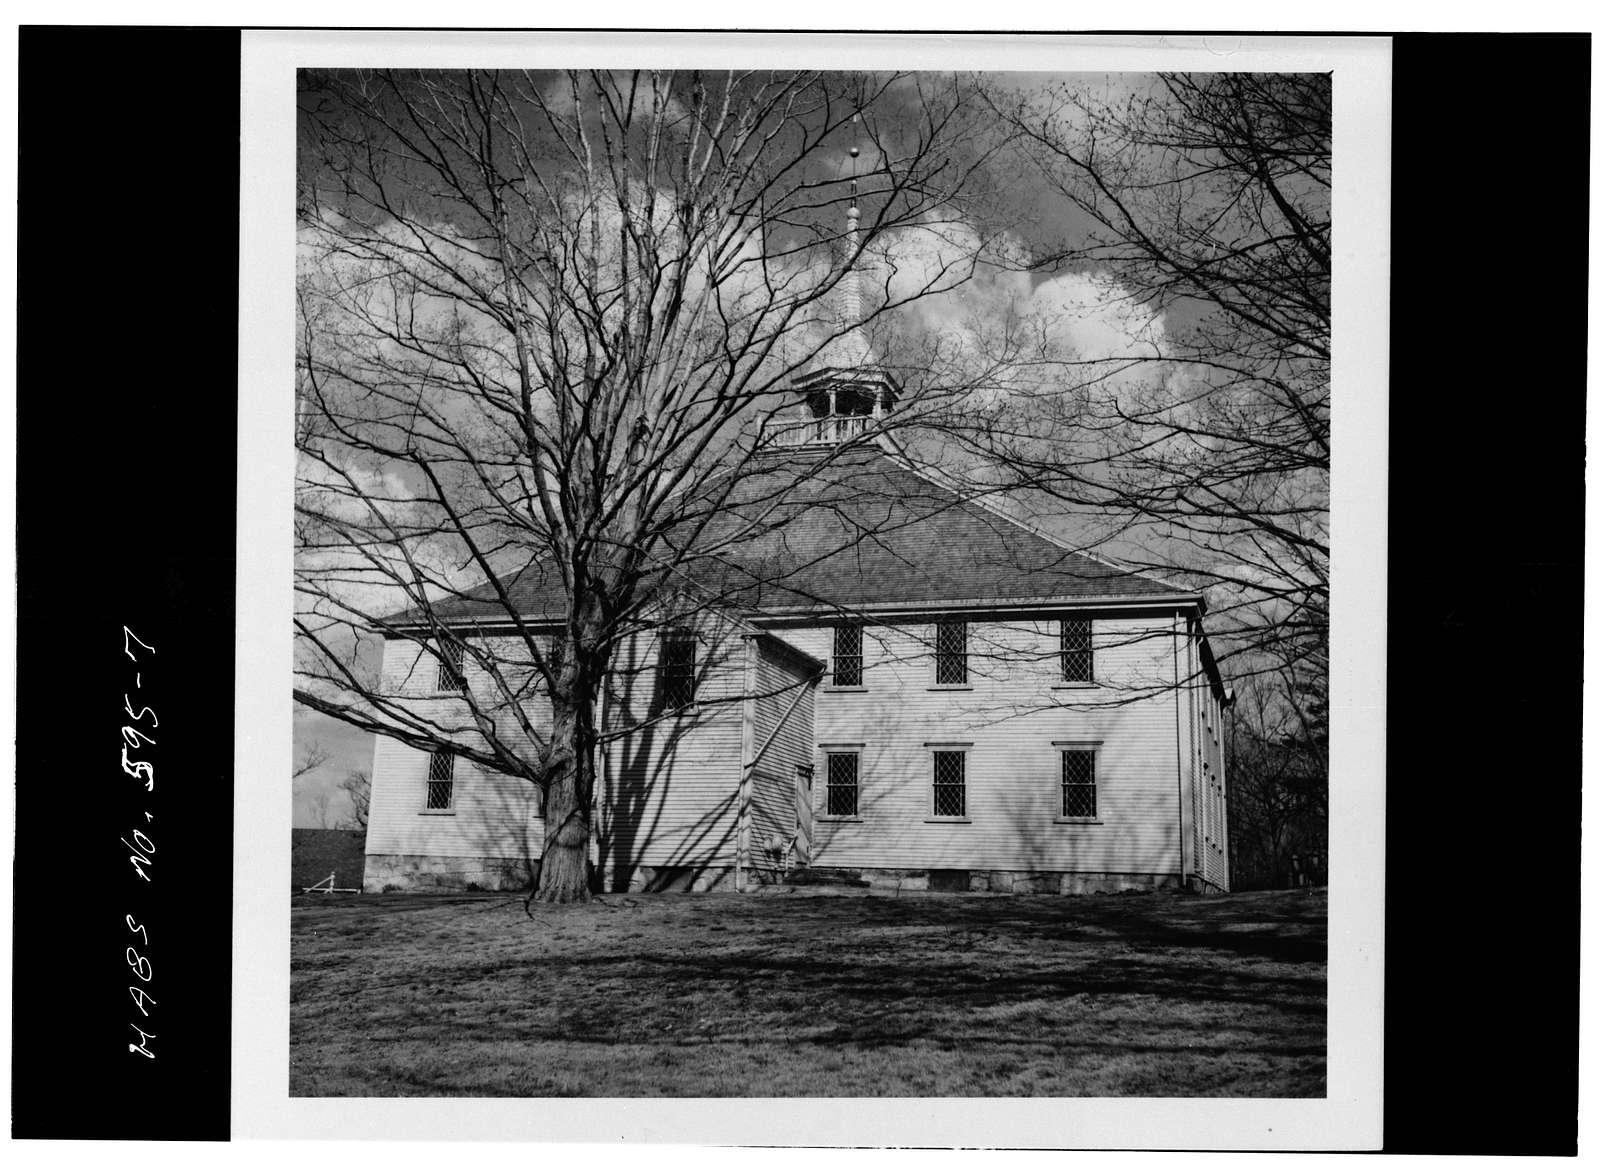 Old Ship Church, 88 Main Street, Hingham, Plymouth County, MA